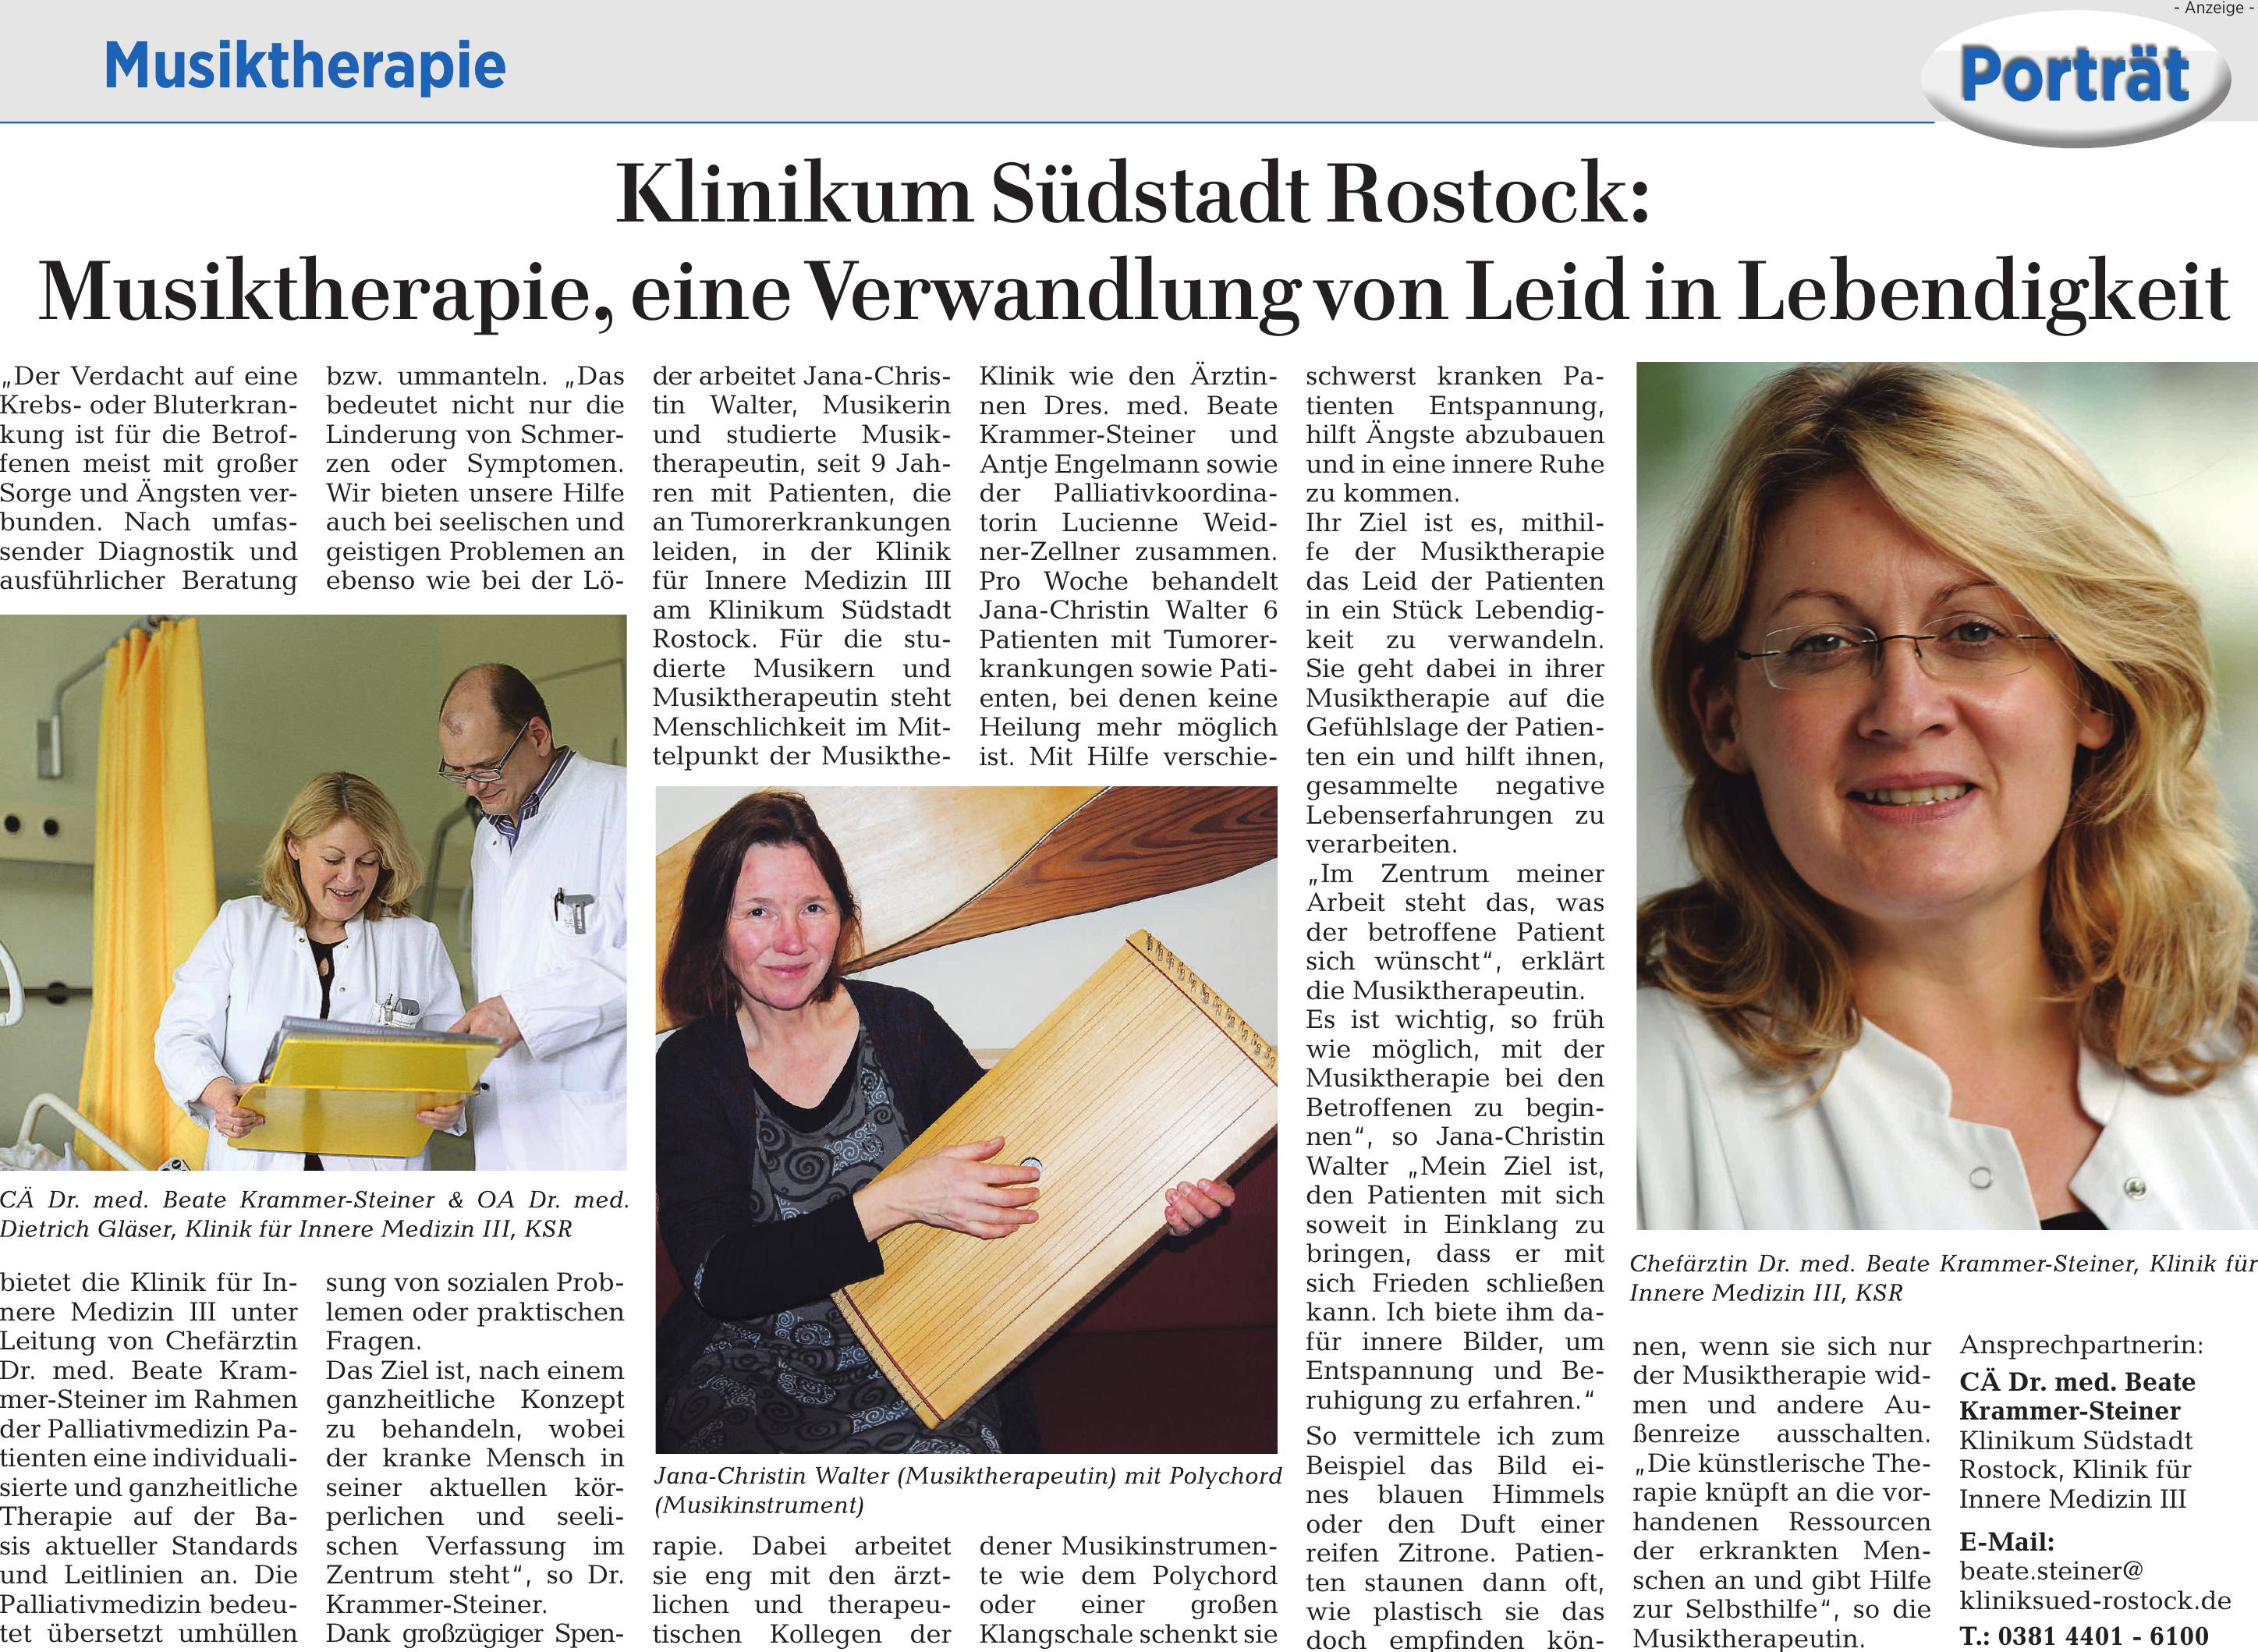 Klinikum Südstadt Rostock - CÄ Dr. med. Beate Krammer-Steiner